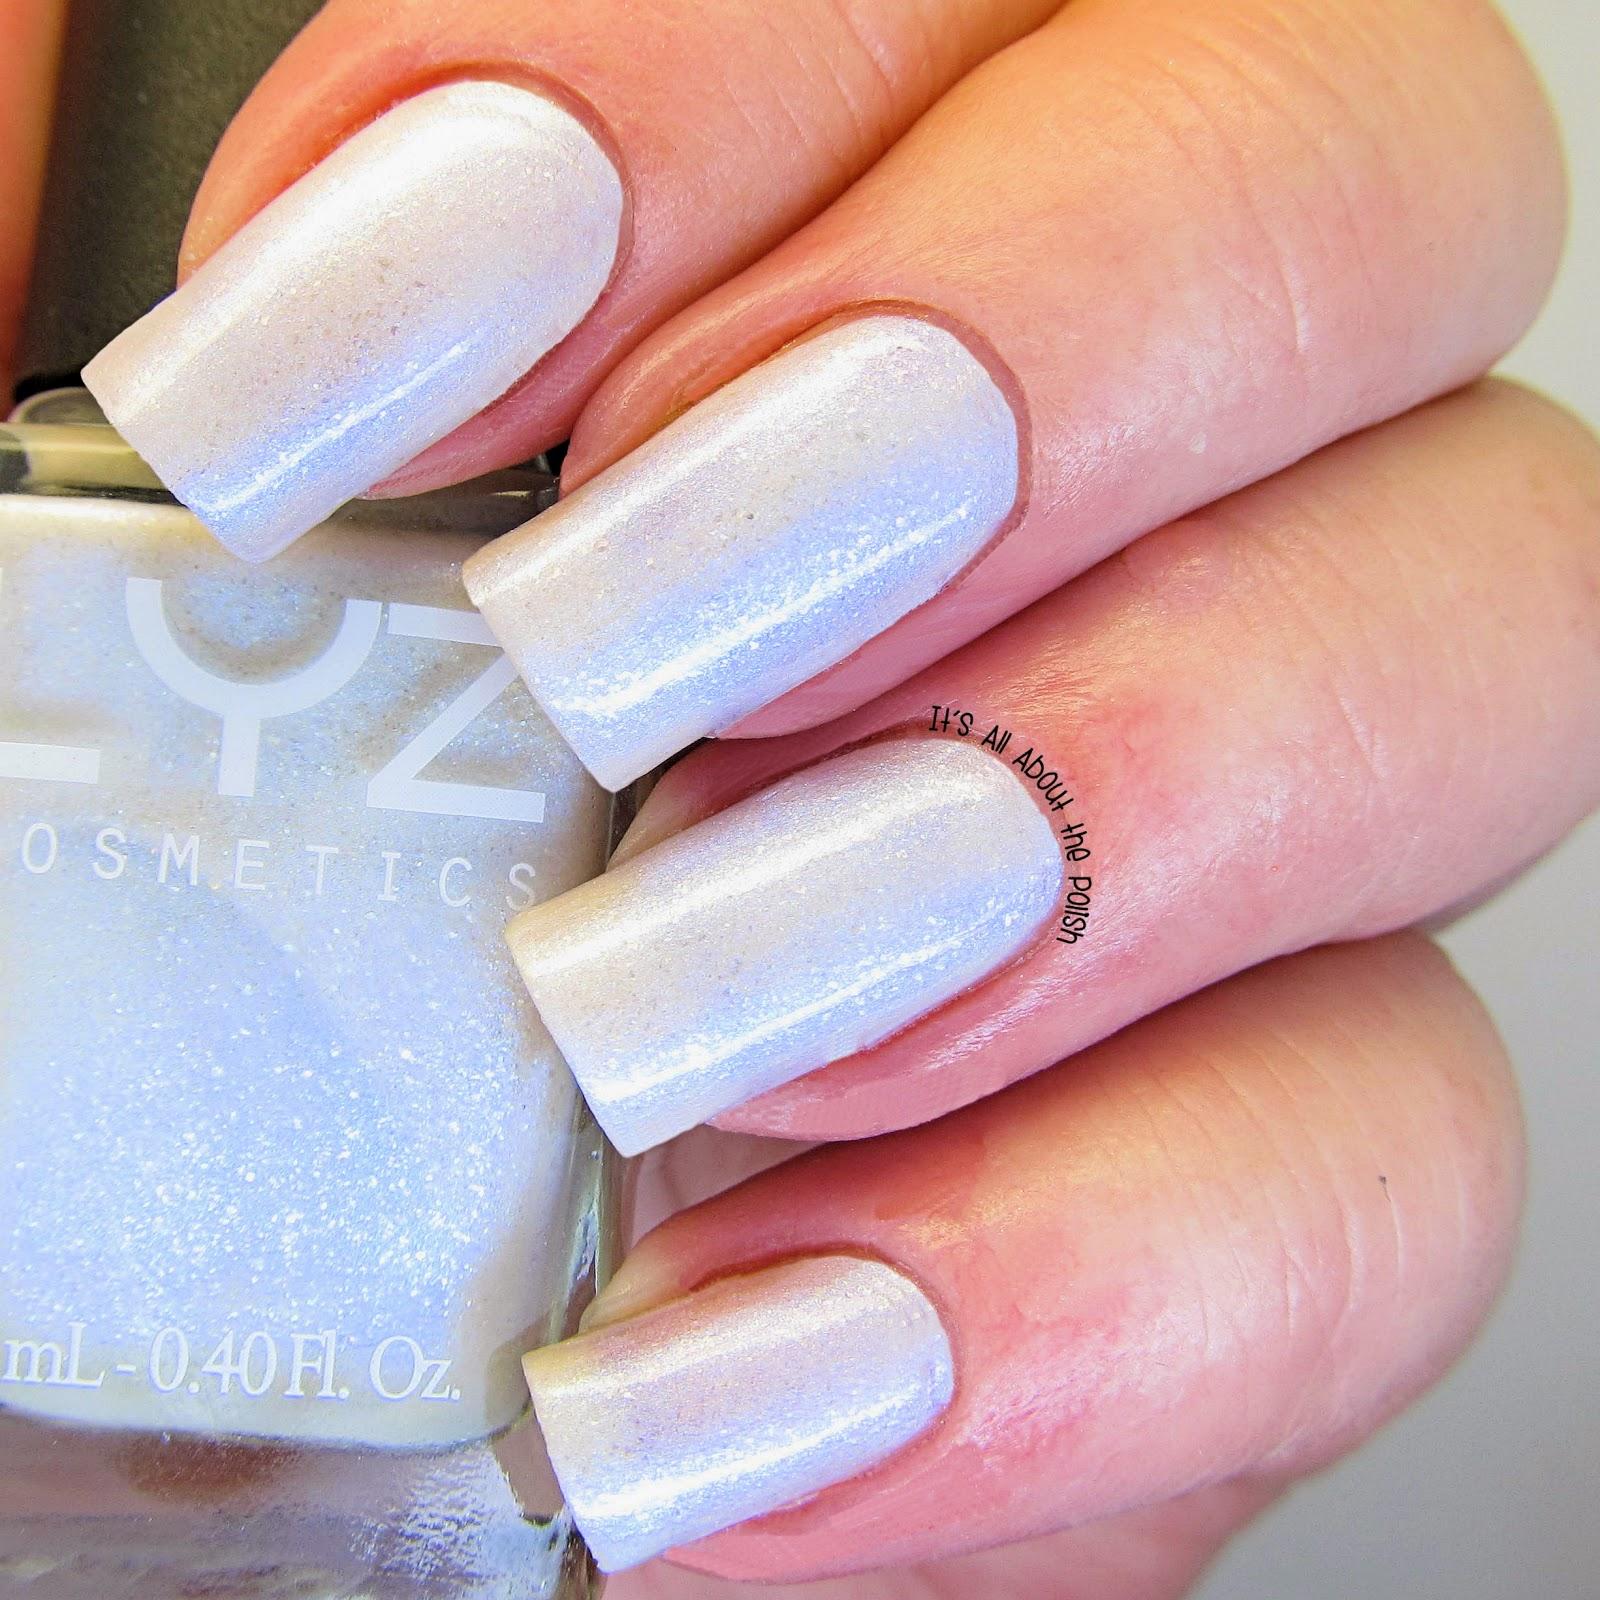 Pearl Nail Polish: It's All About The Polish: Review Liz Cosmetics Nail Polish